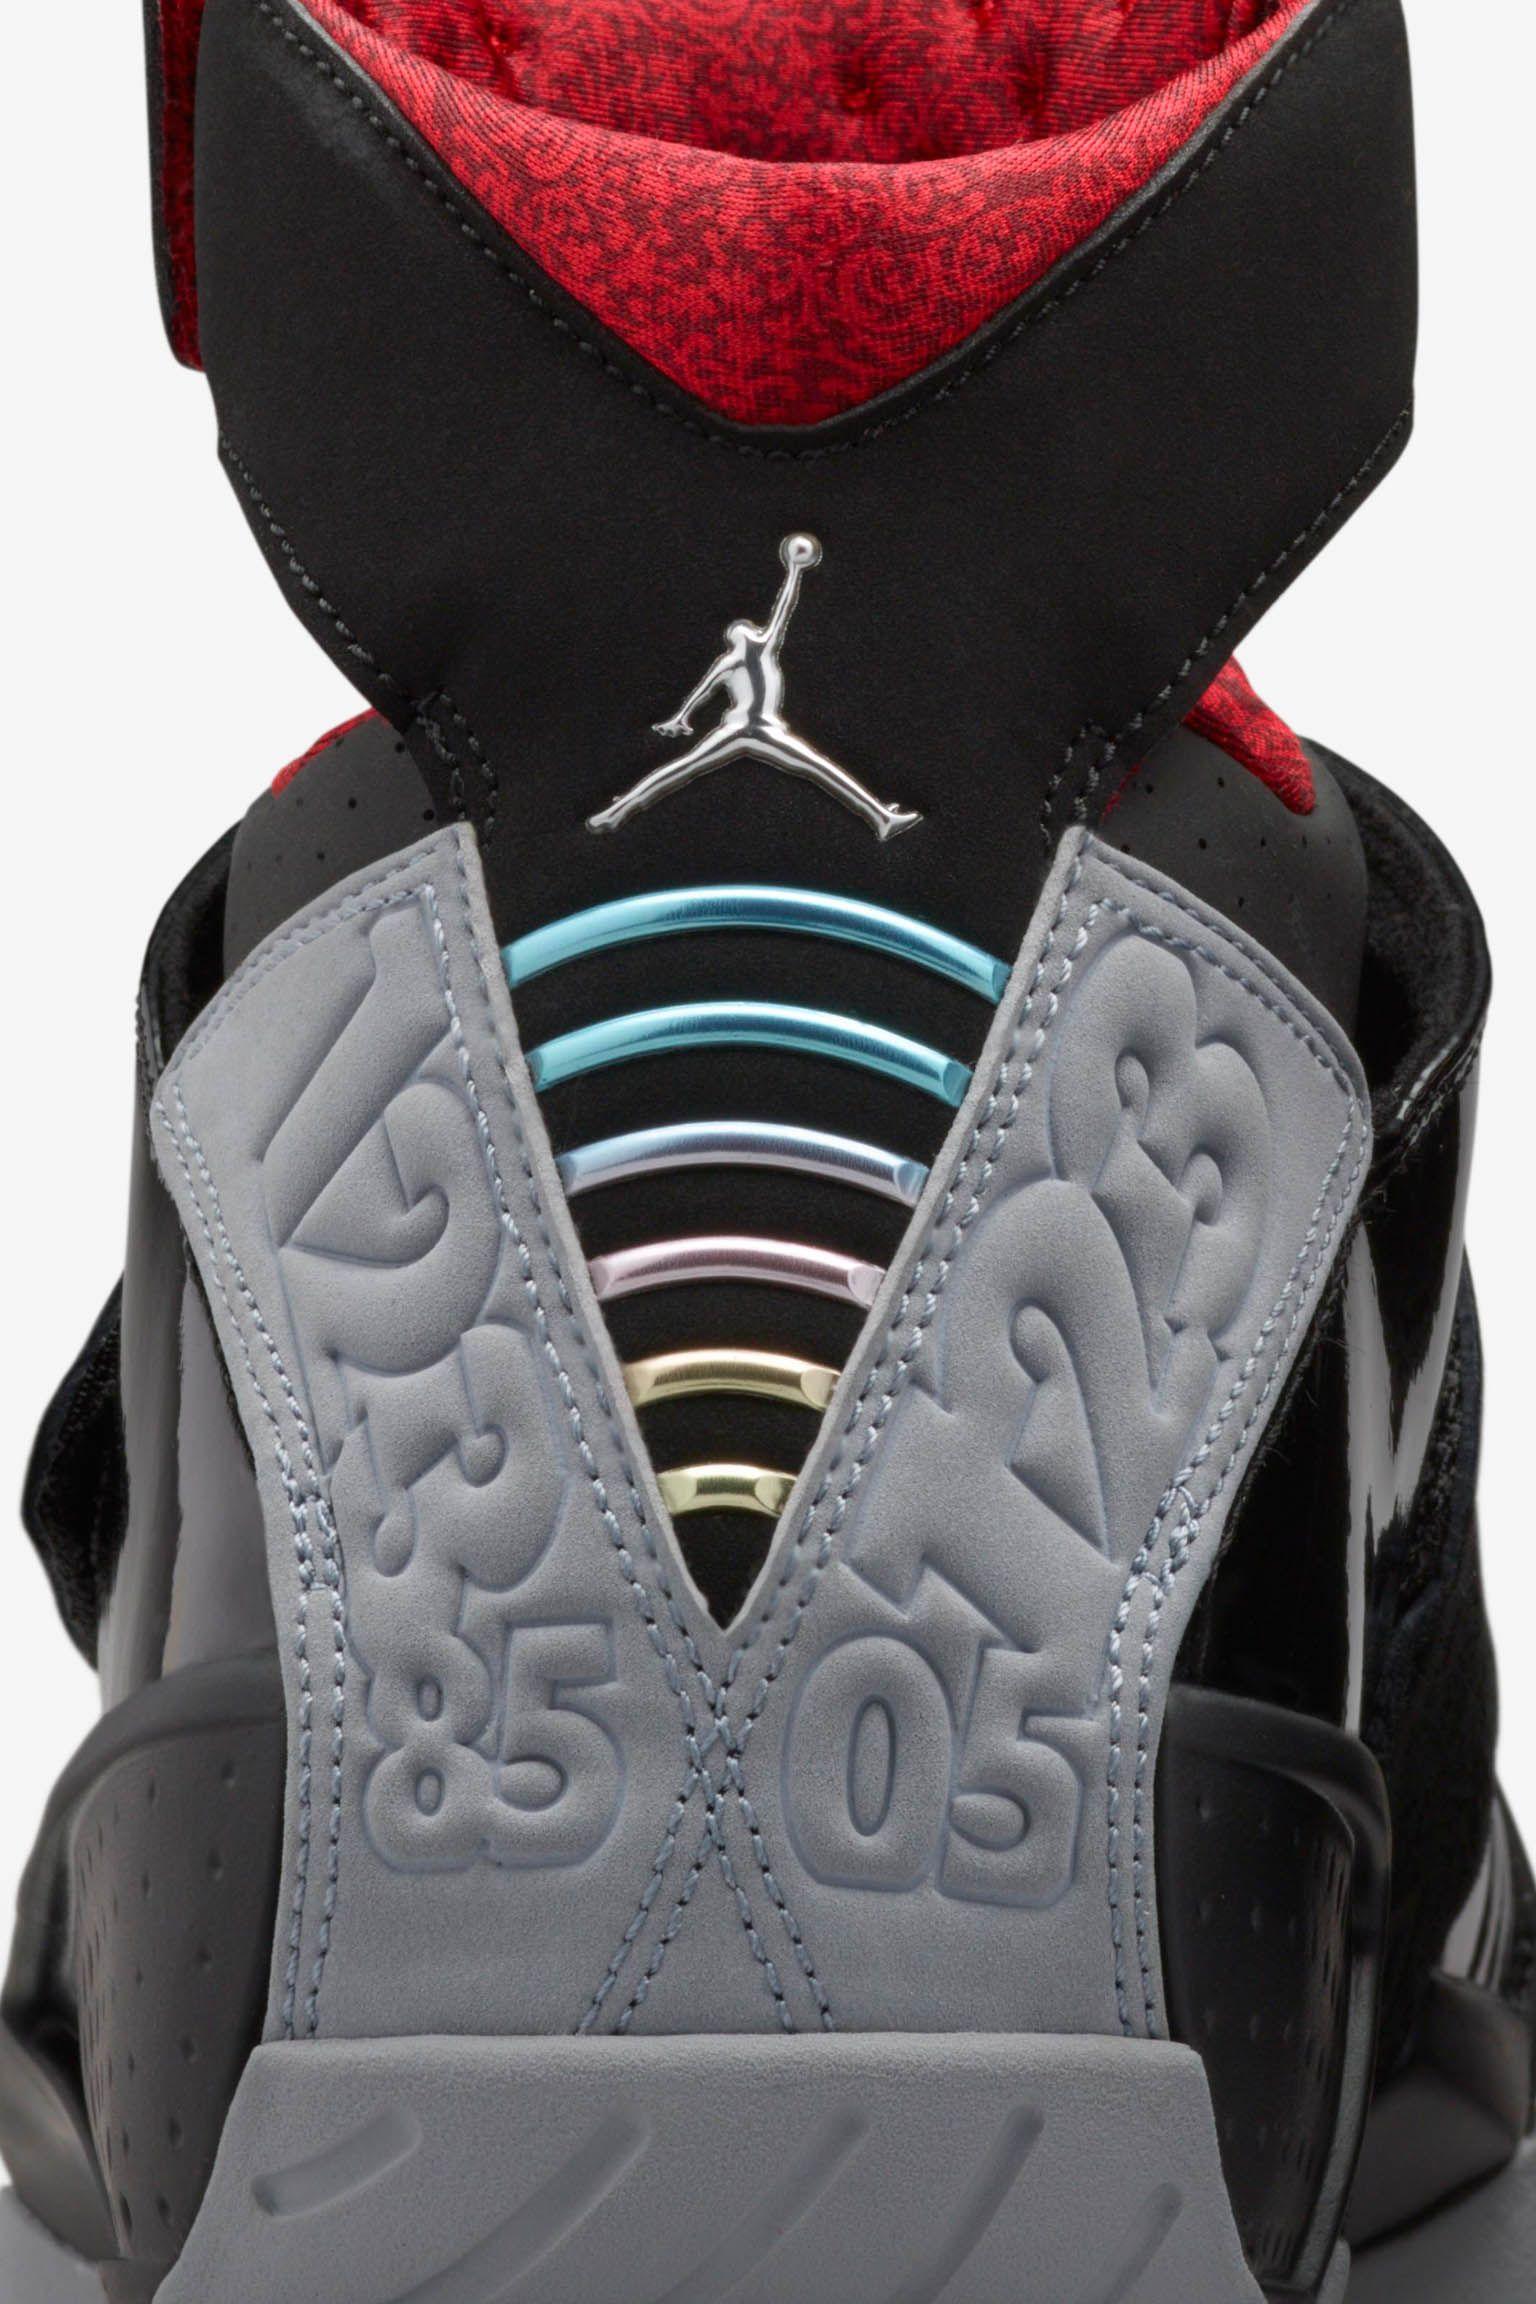 Air Jordan 20 'Stealth' Release Date